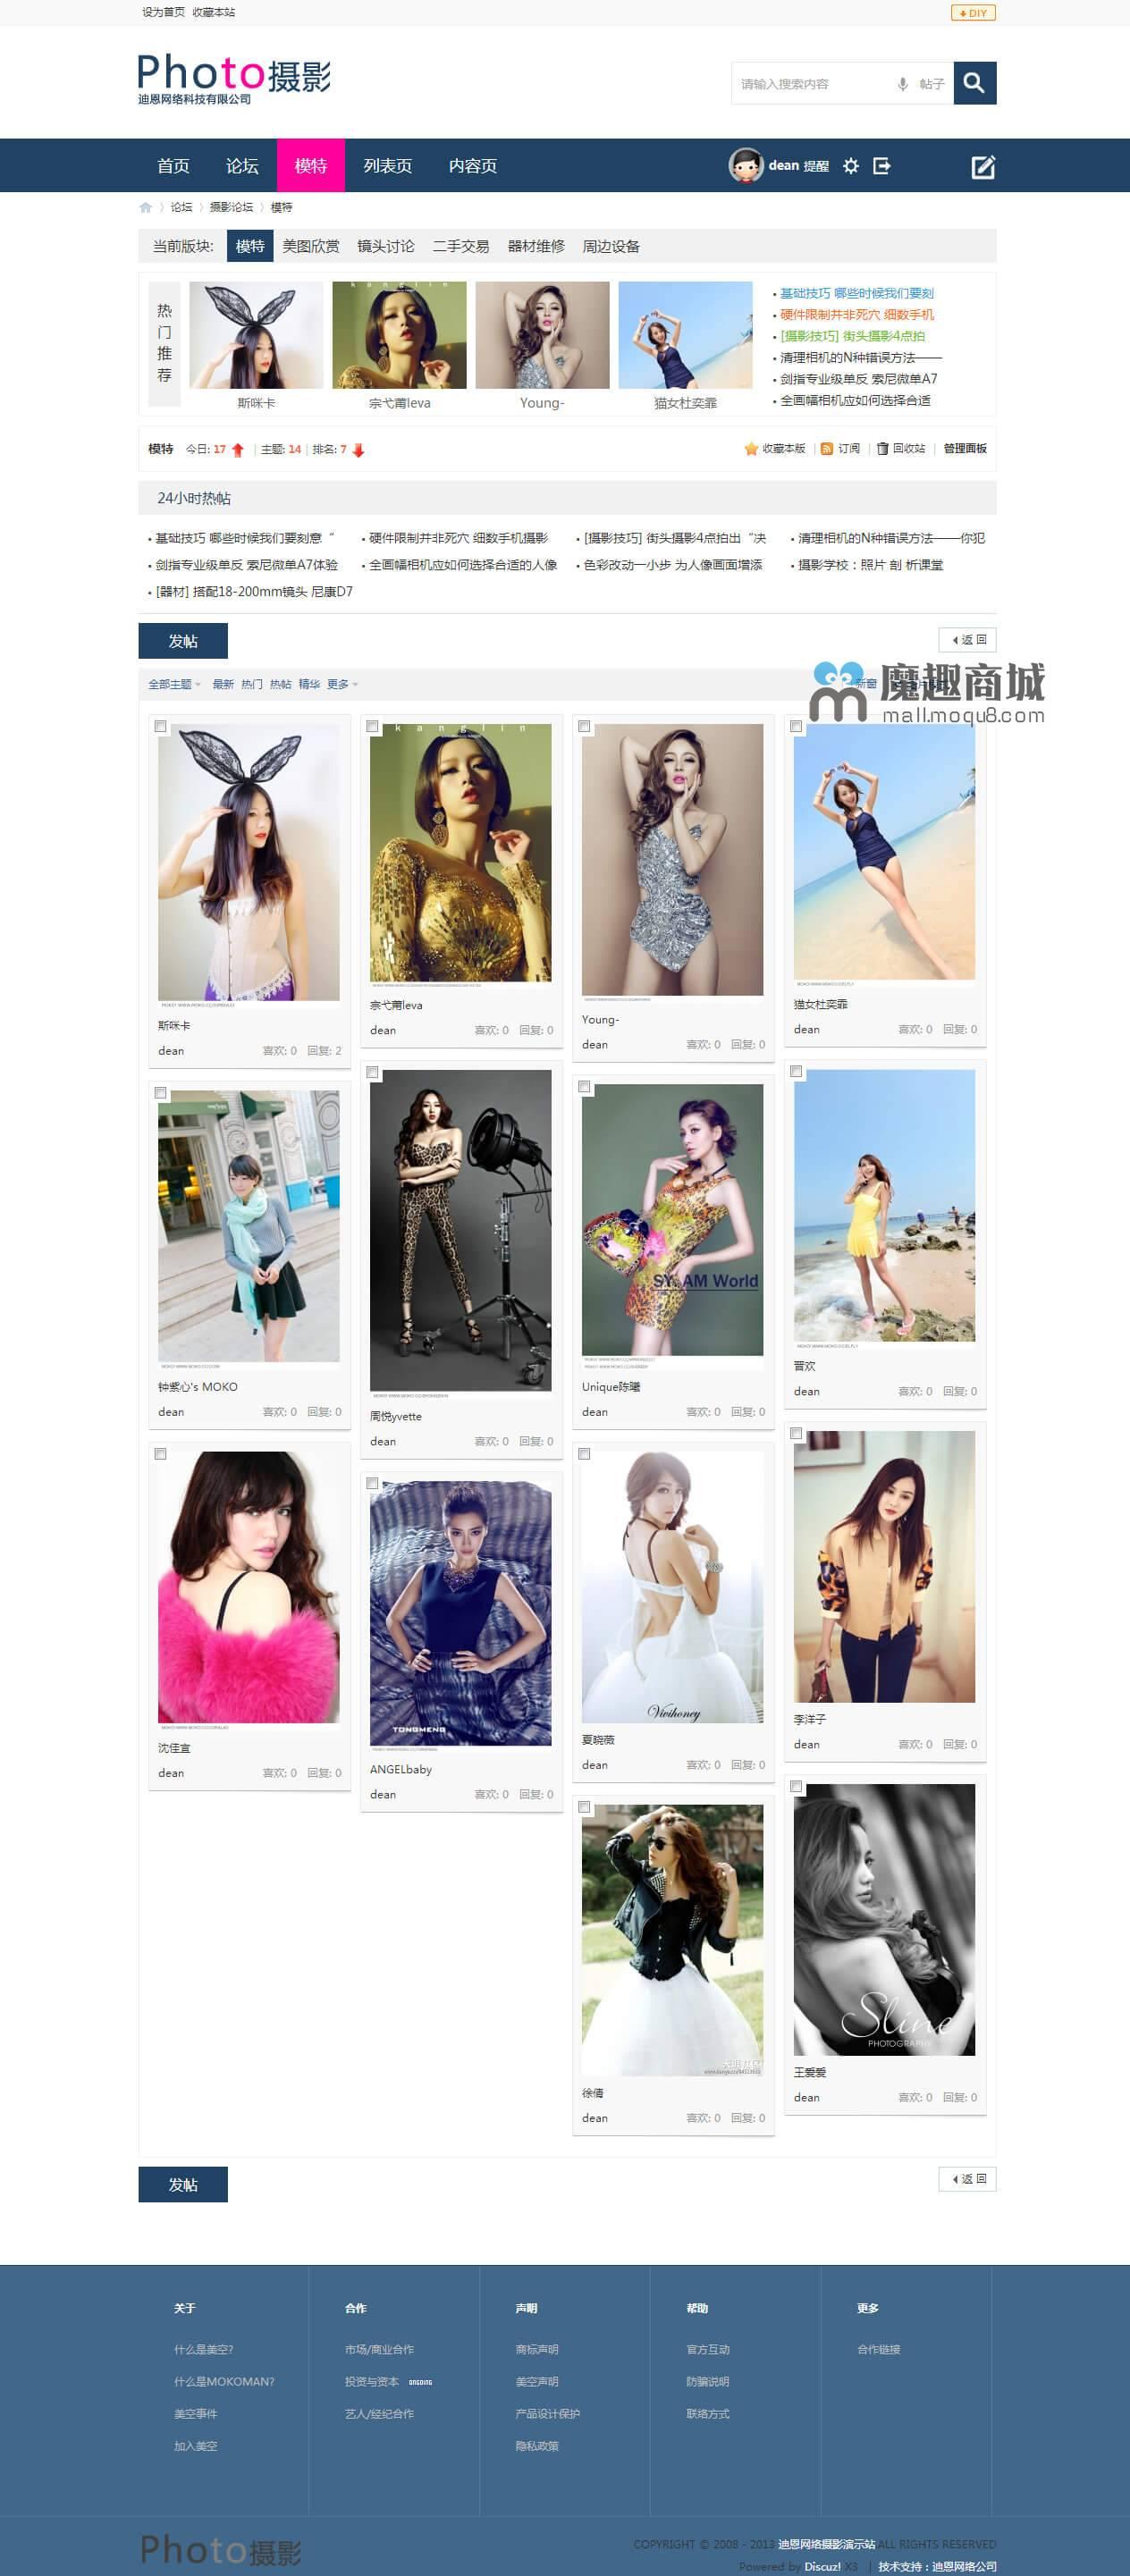 MOKO摄影图片作品展示门户GBK+UTF8